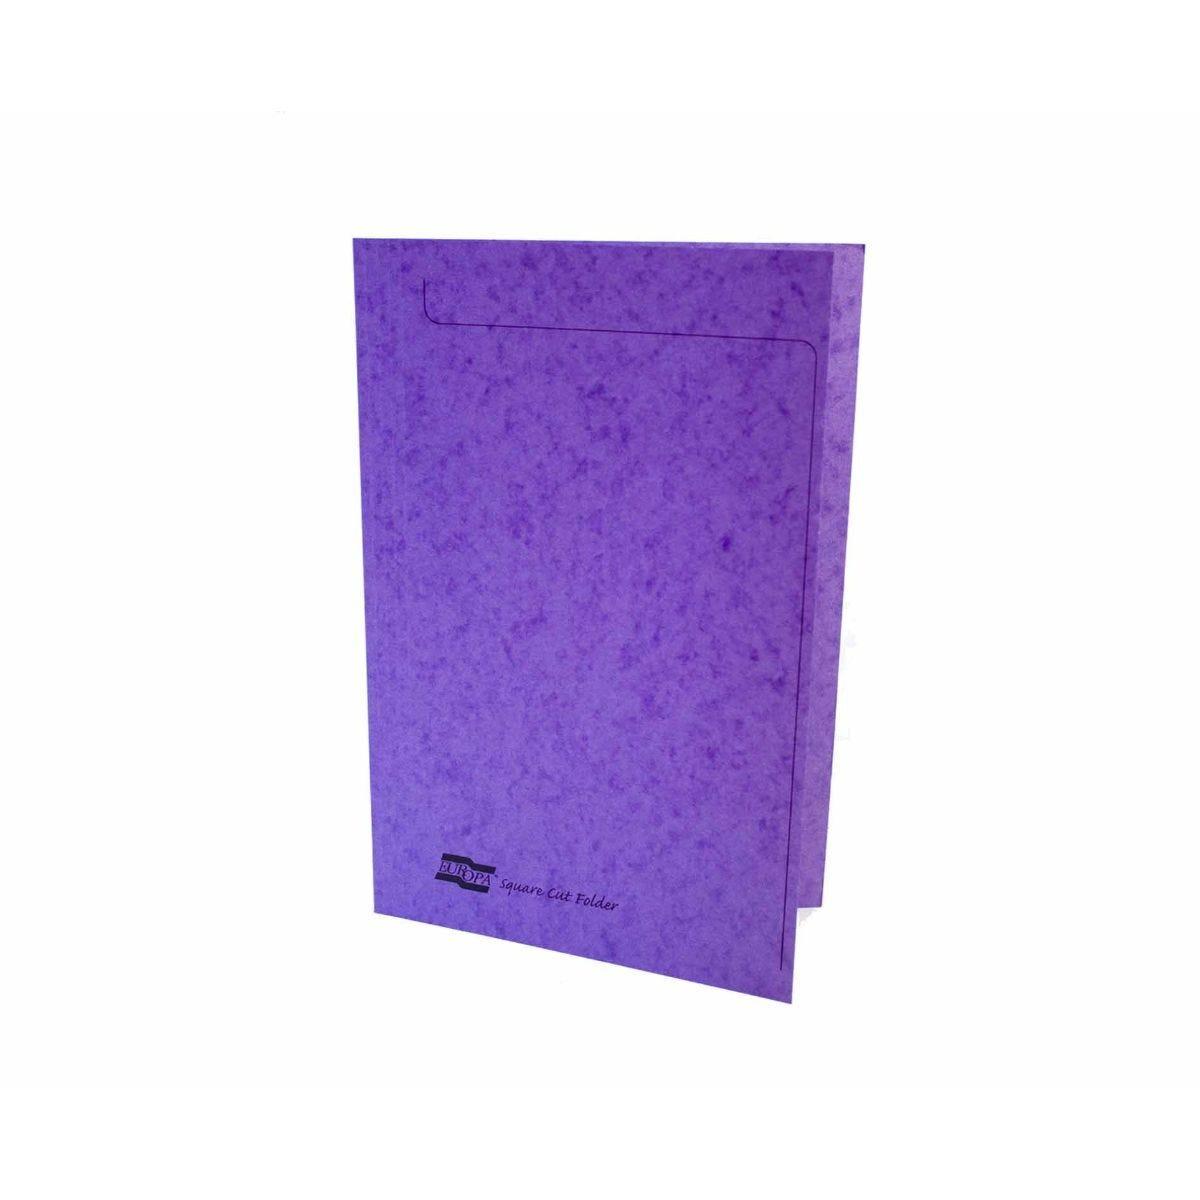 Exacompta Europa Square Cut Folder A4 Pack of 50 Lilac Purple